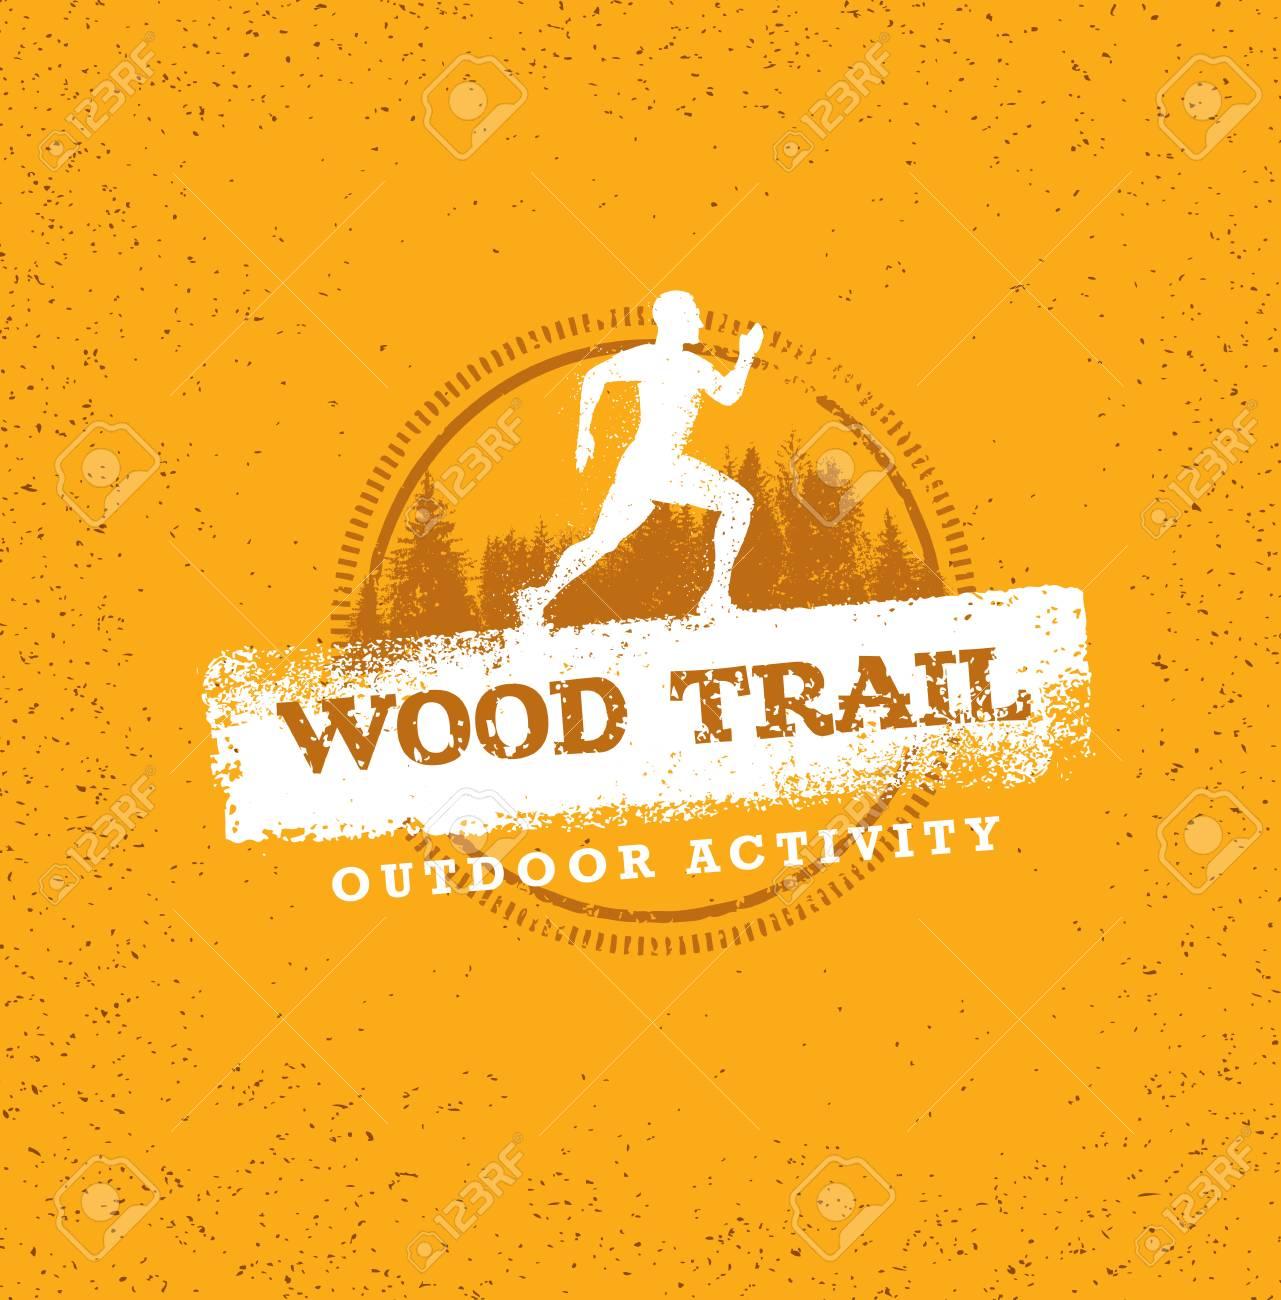 Mountain Adventure Sport Trail. Creative Vector Outdoor Concept on Grunge Background - 72316756